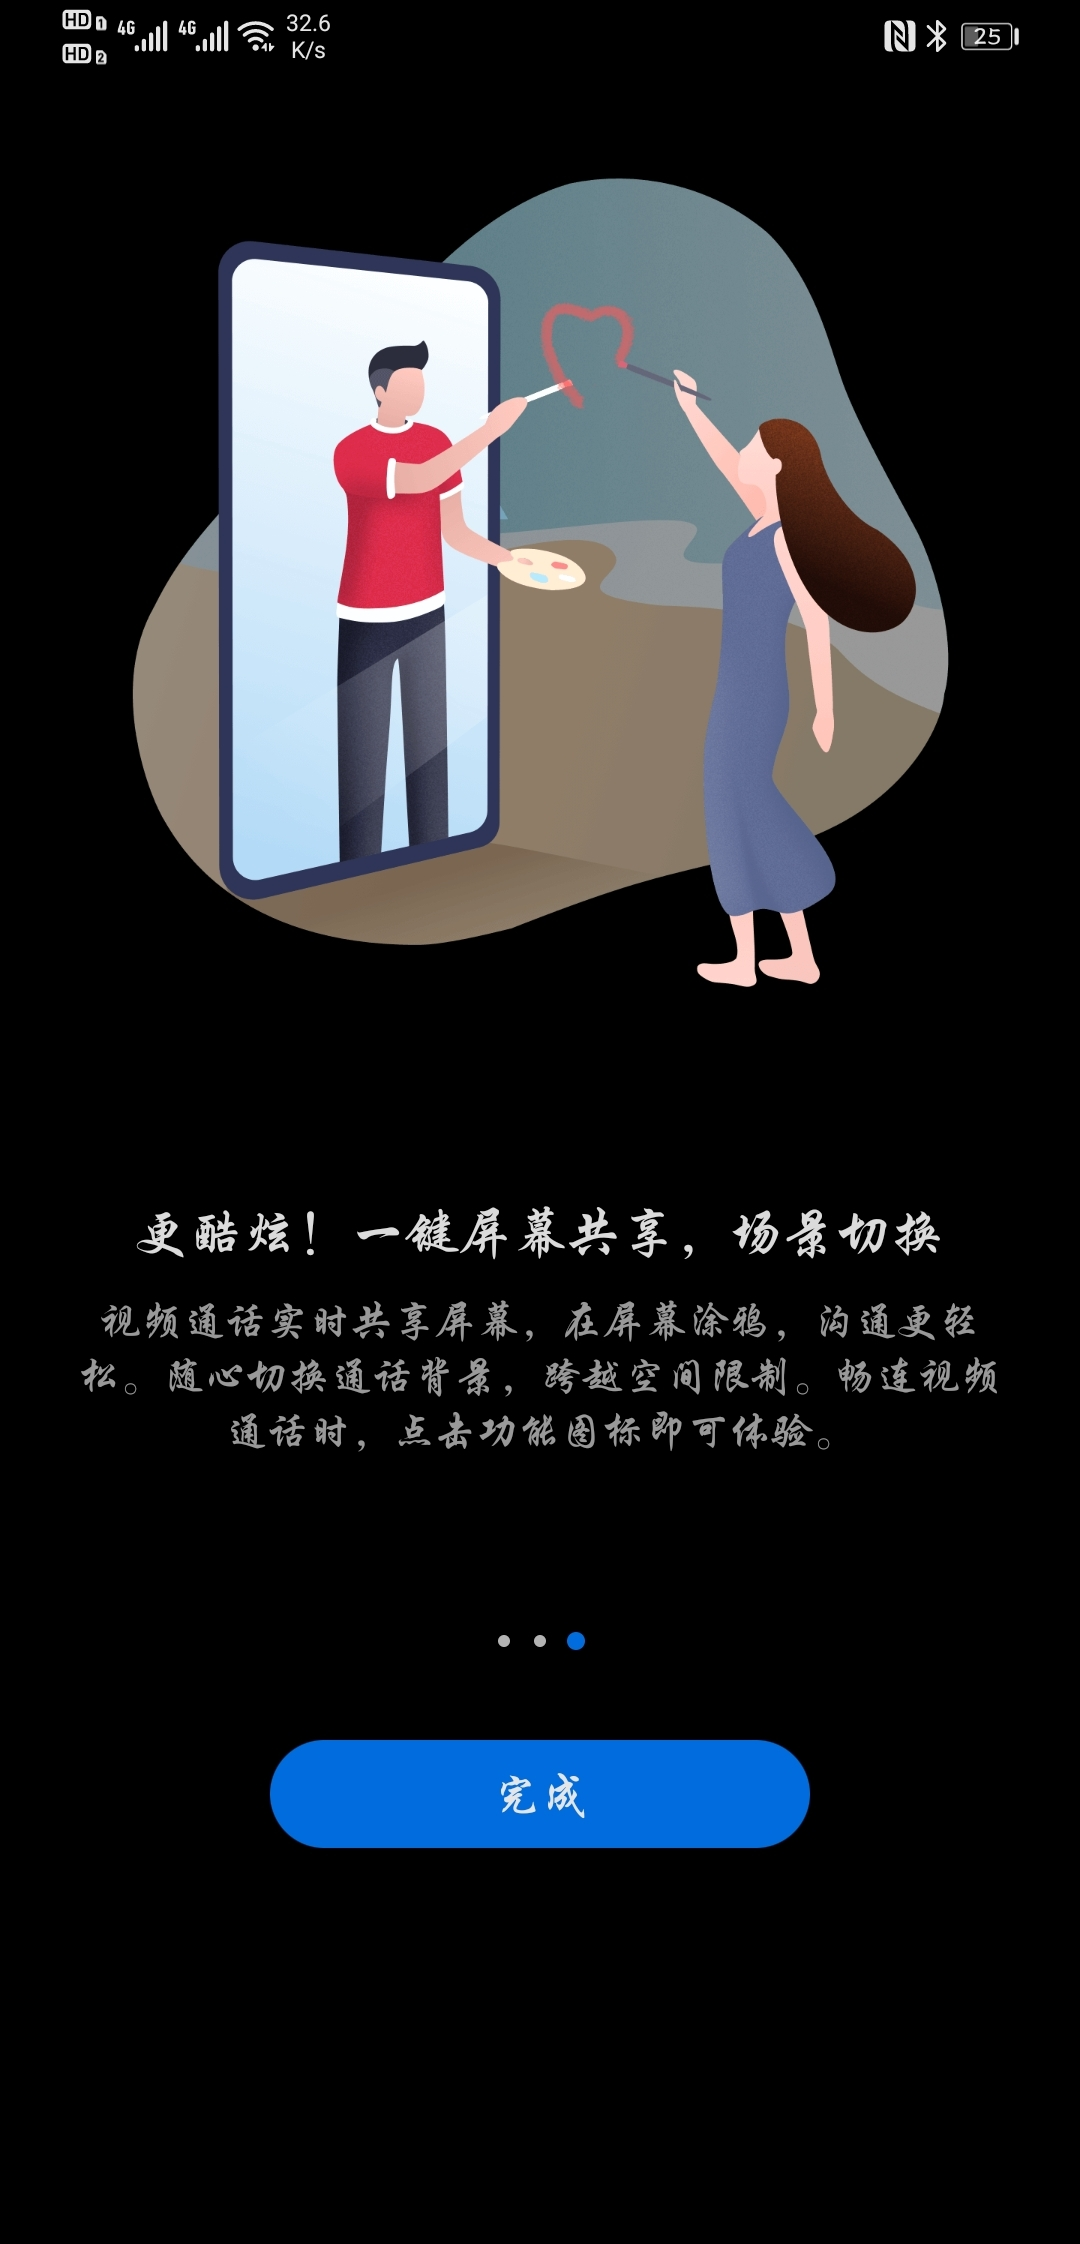 Screenshot_20200515_081125_com.huawei.android.hwupgradeguide.jpg